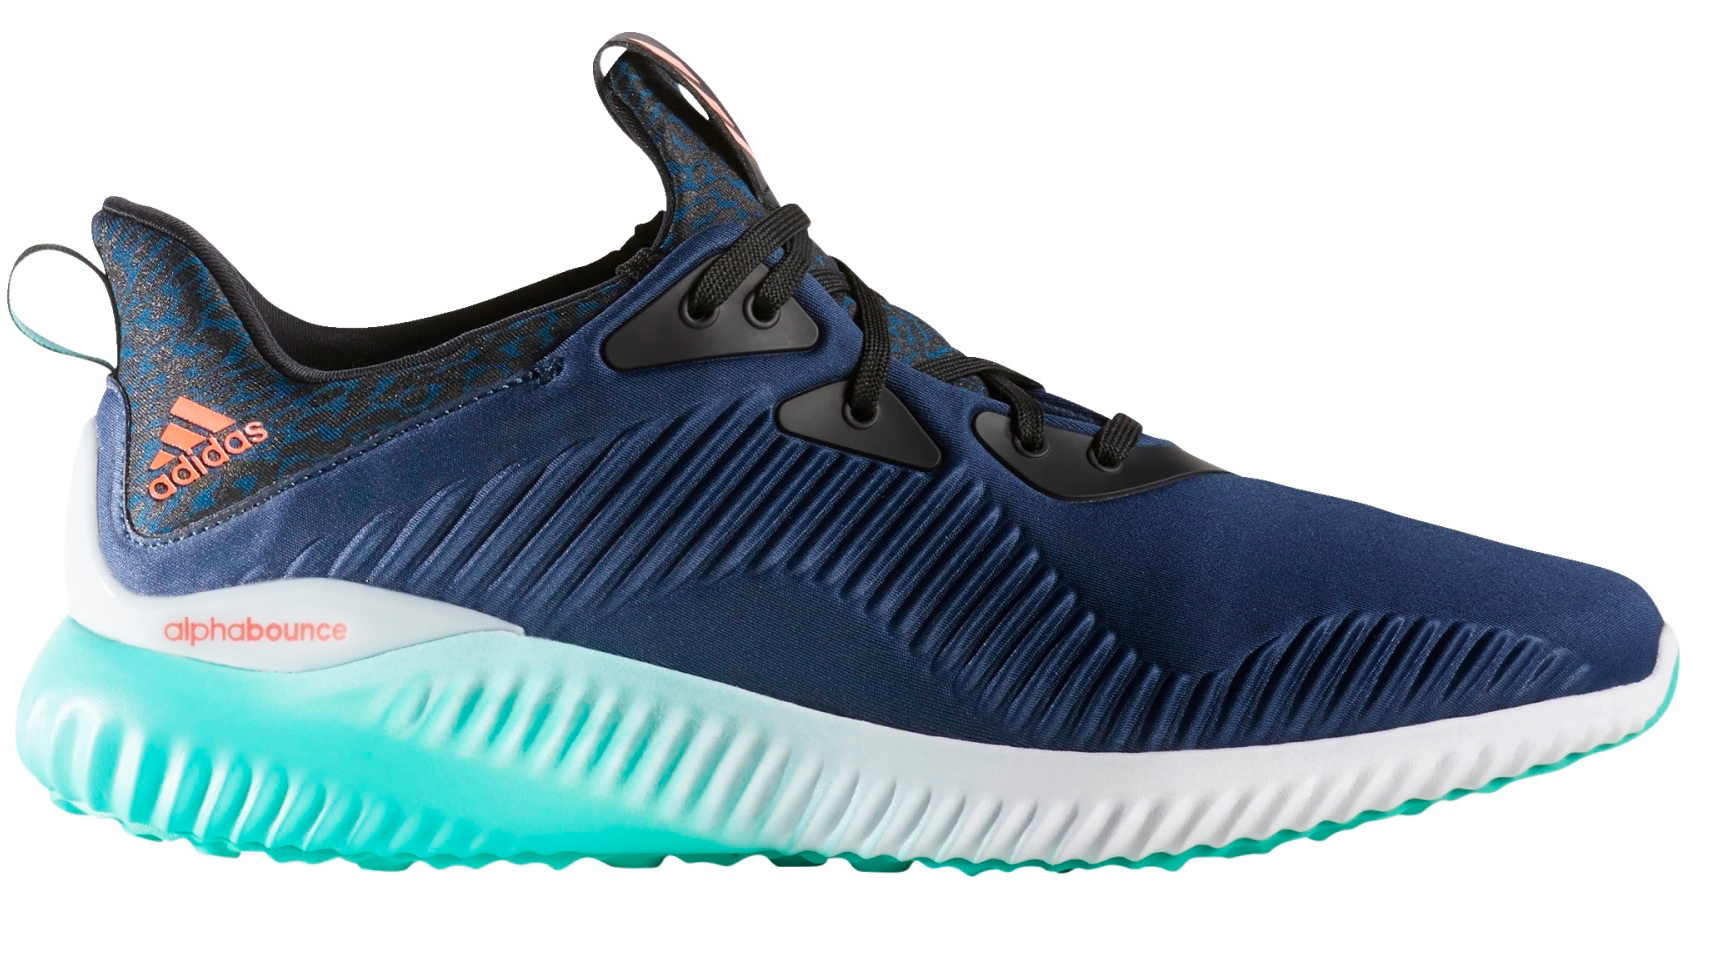 d9101aec6 Mens Shoes AlphaBounce colore Blue White - Adidas - SportIT.com